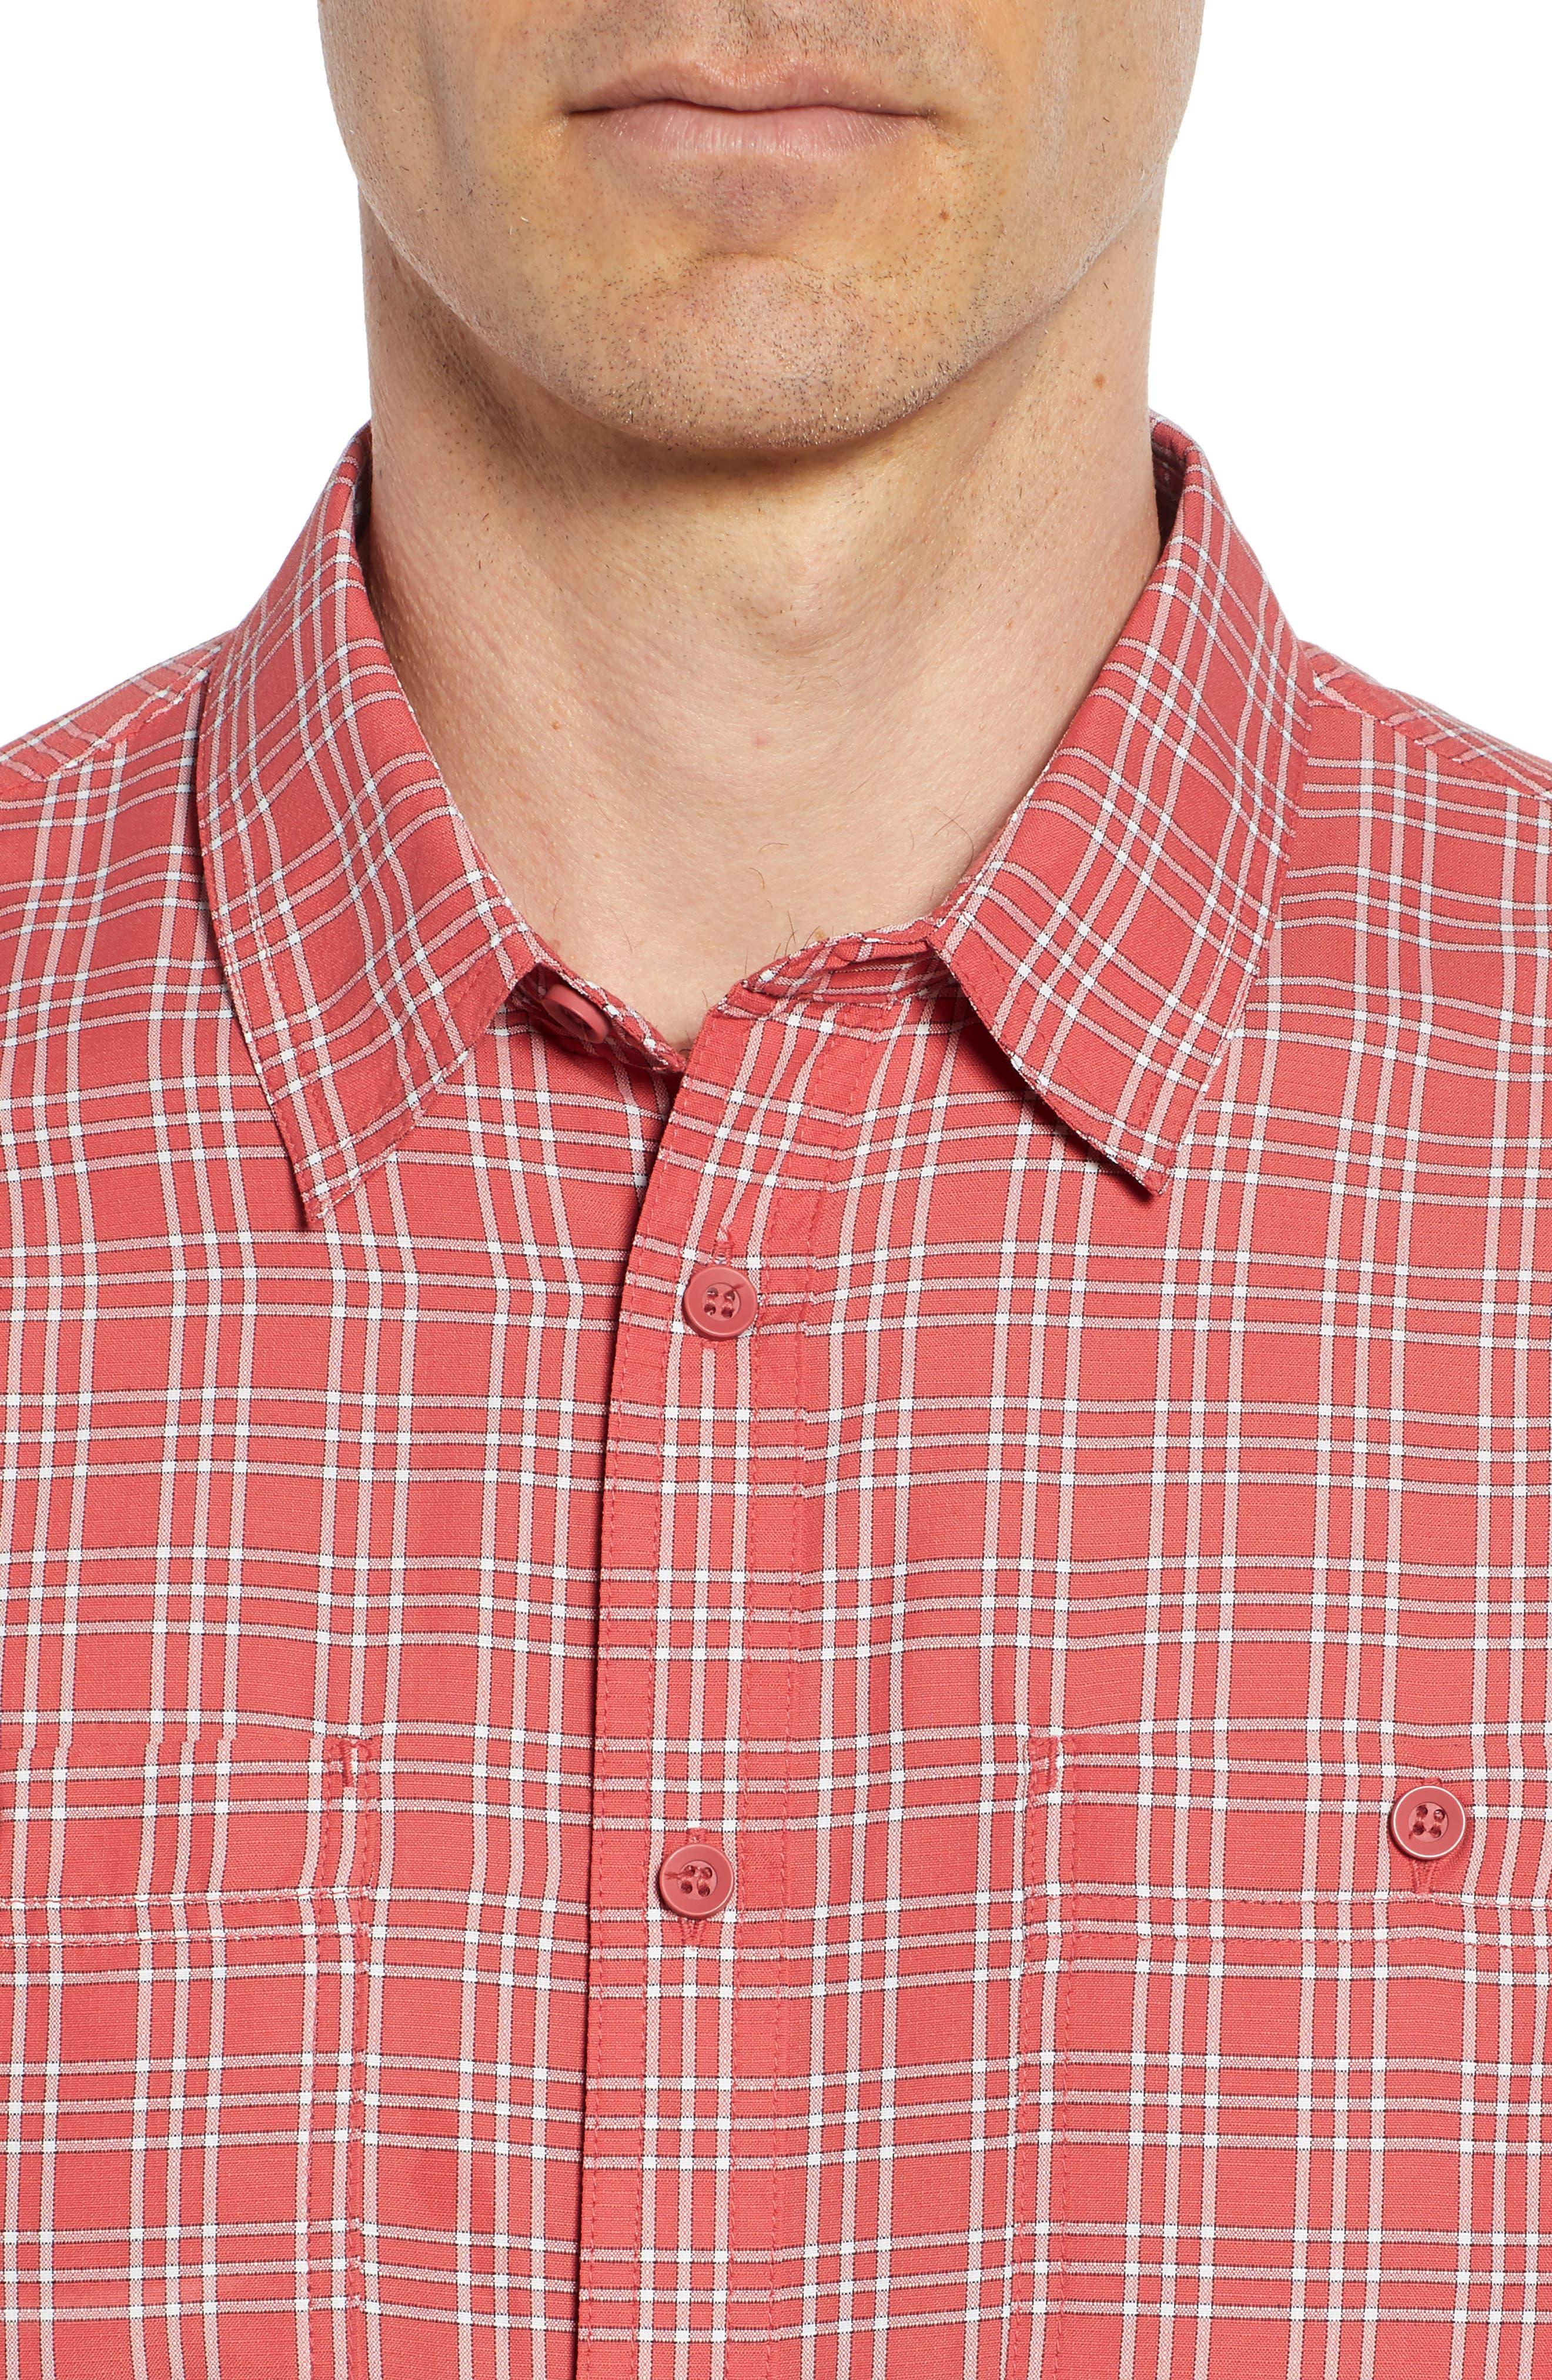 Wake Plaid Regular Fit Performance Sport Shirt,                             Alternate thumbnail 4, color,                             600